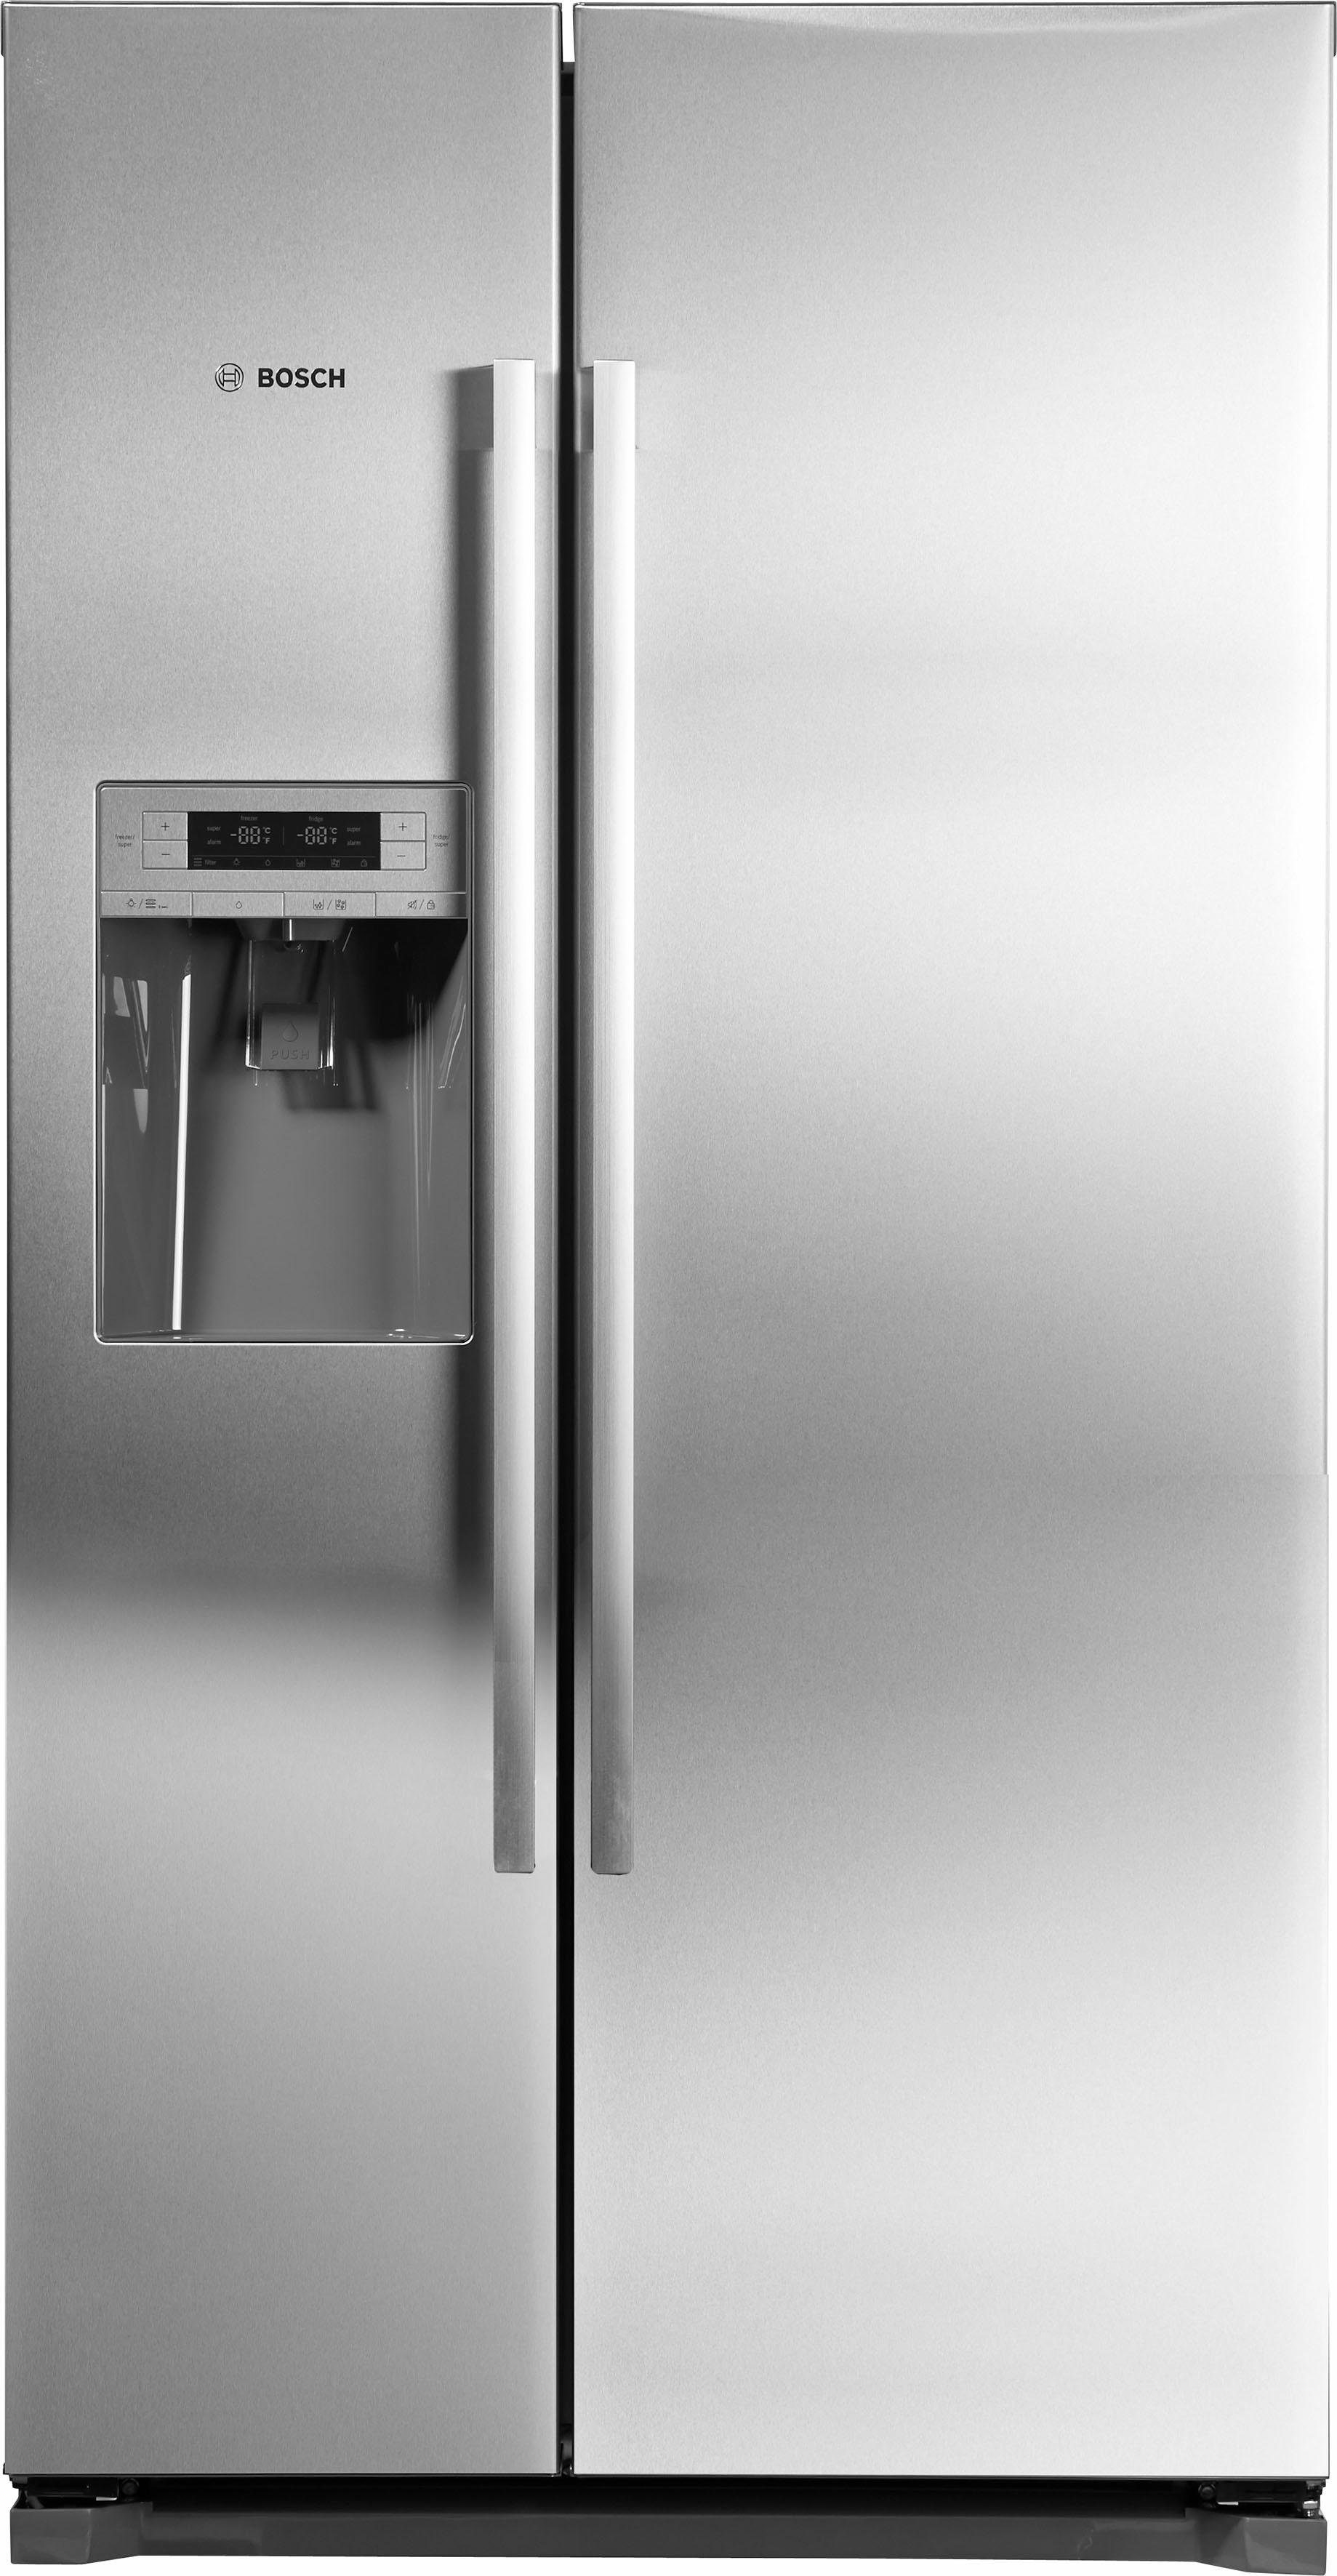 BOSCH Side-by-Side 151 KAD90VI30, 177 cm hoch, 59,5 cm breit, Energieeffizienzklasse: A++, 177 cm hoch, NoFrost